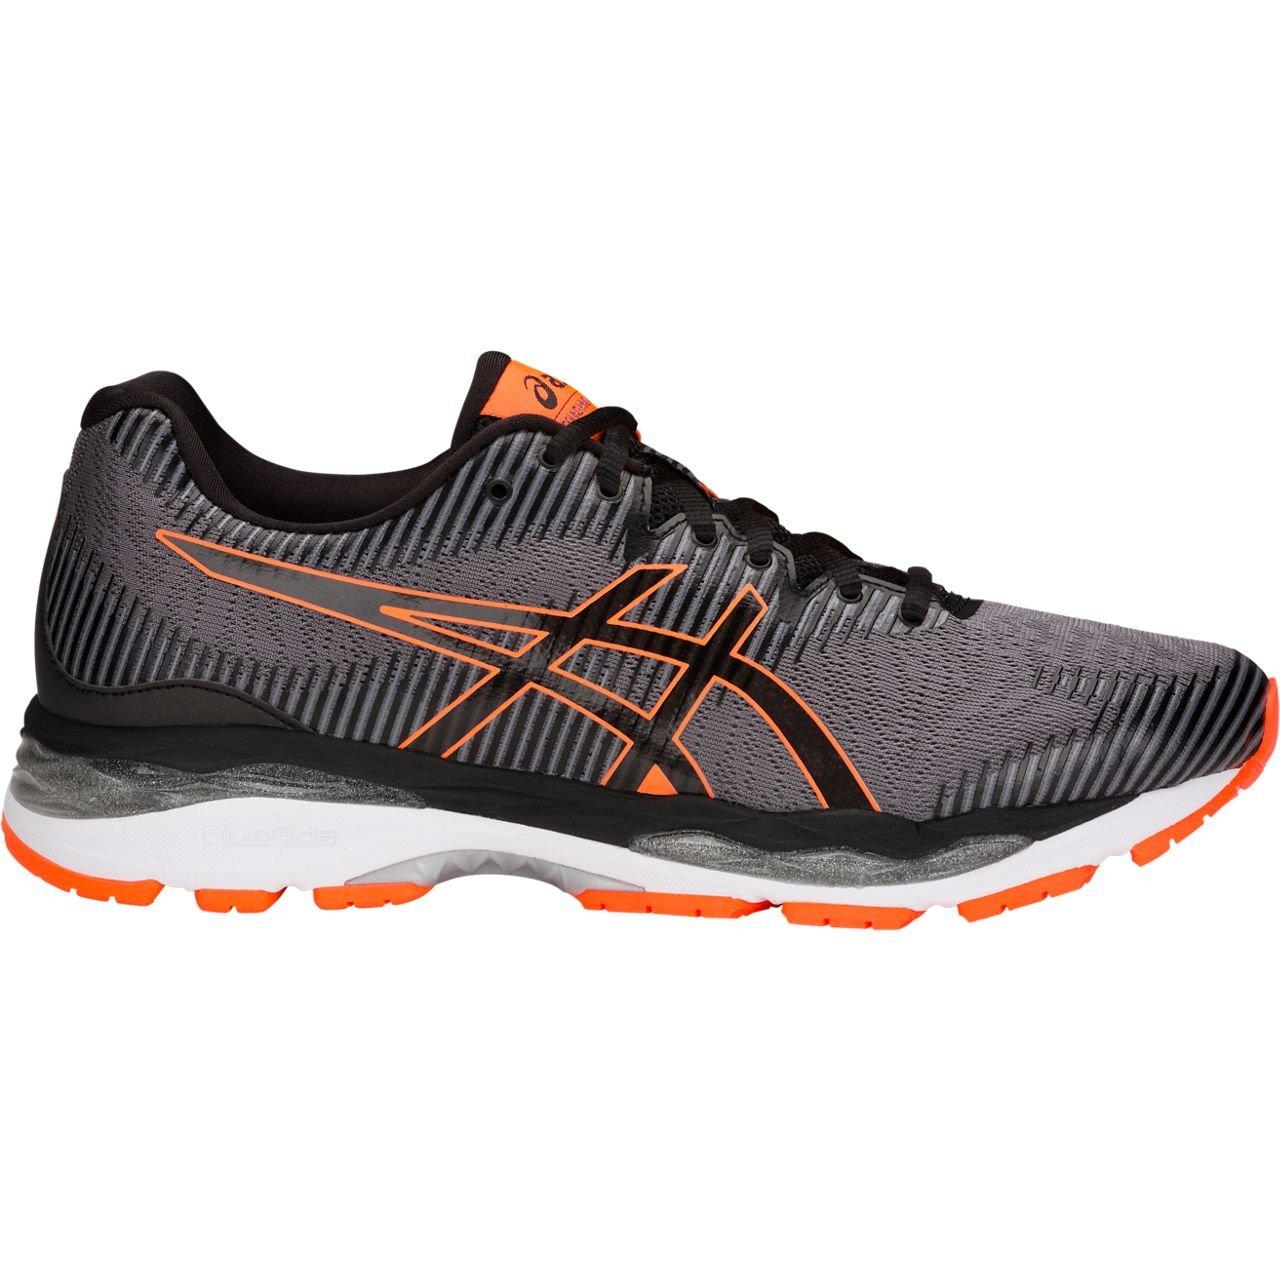 ASICS Men's Gel-Ziruss 2 Running Shoe B07D9P6DC4 10.5 D(M) US|Carbon/Black